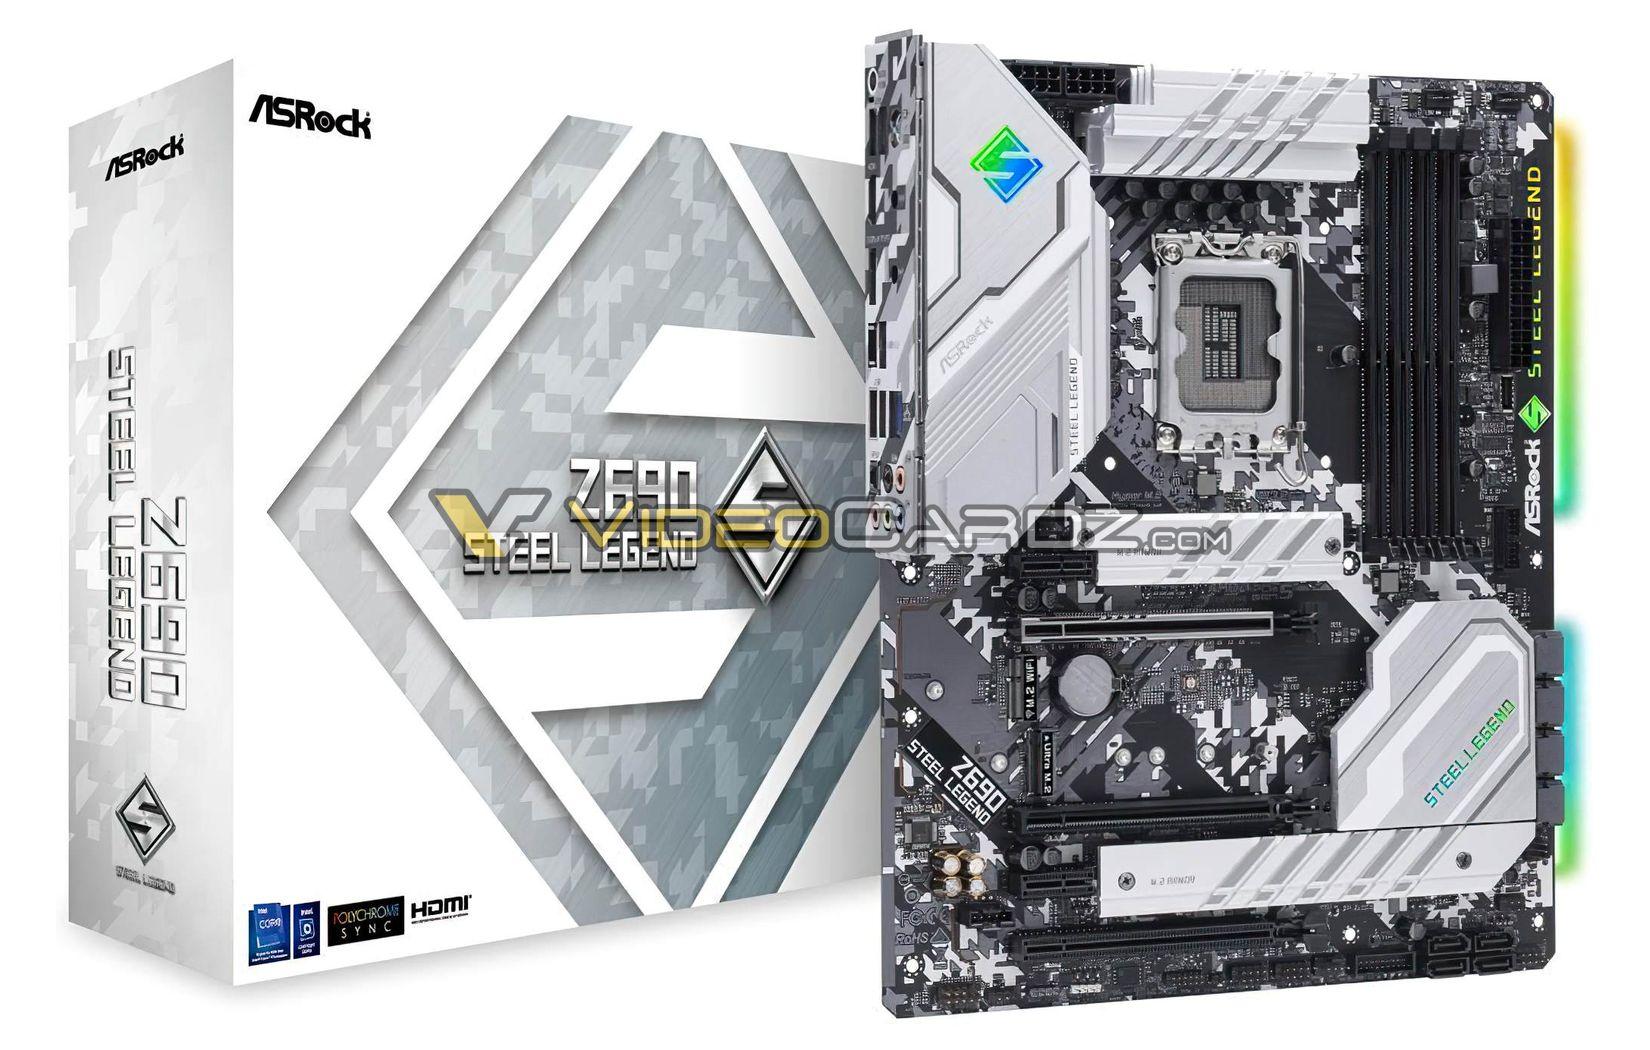 Знакомимся с платами ASRock LGA1700/Z690 для процессоров Core 12-го поколения